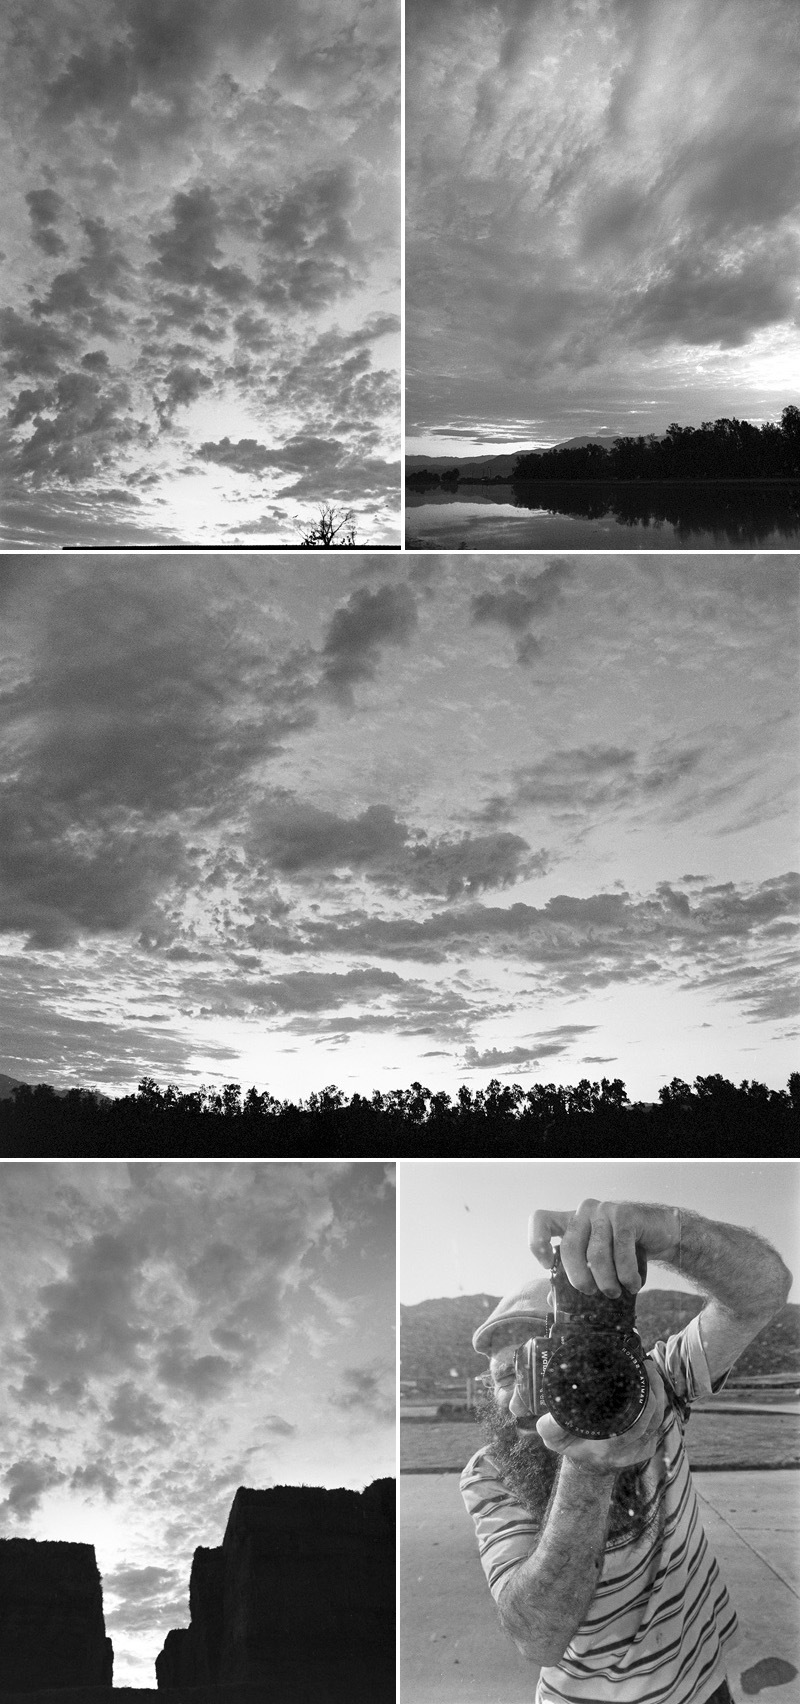 storyboard-comp-13.jpg